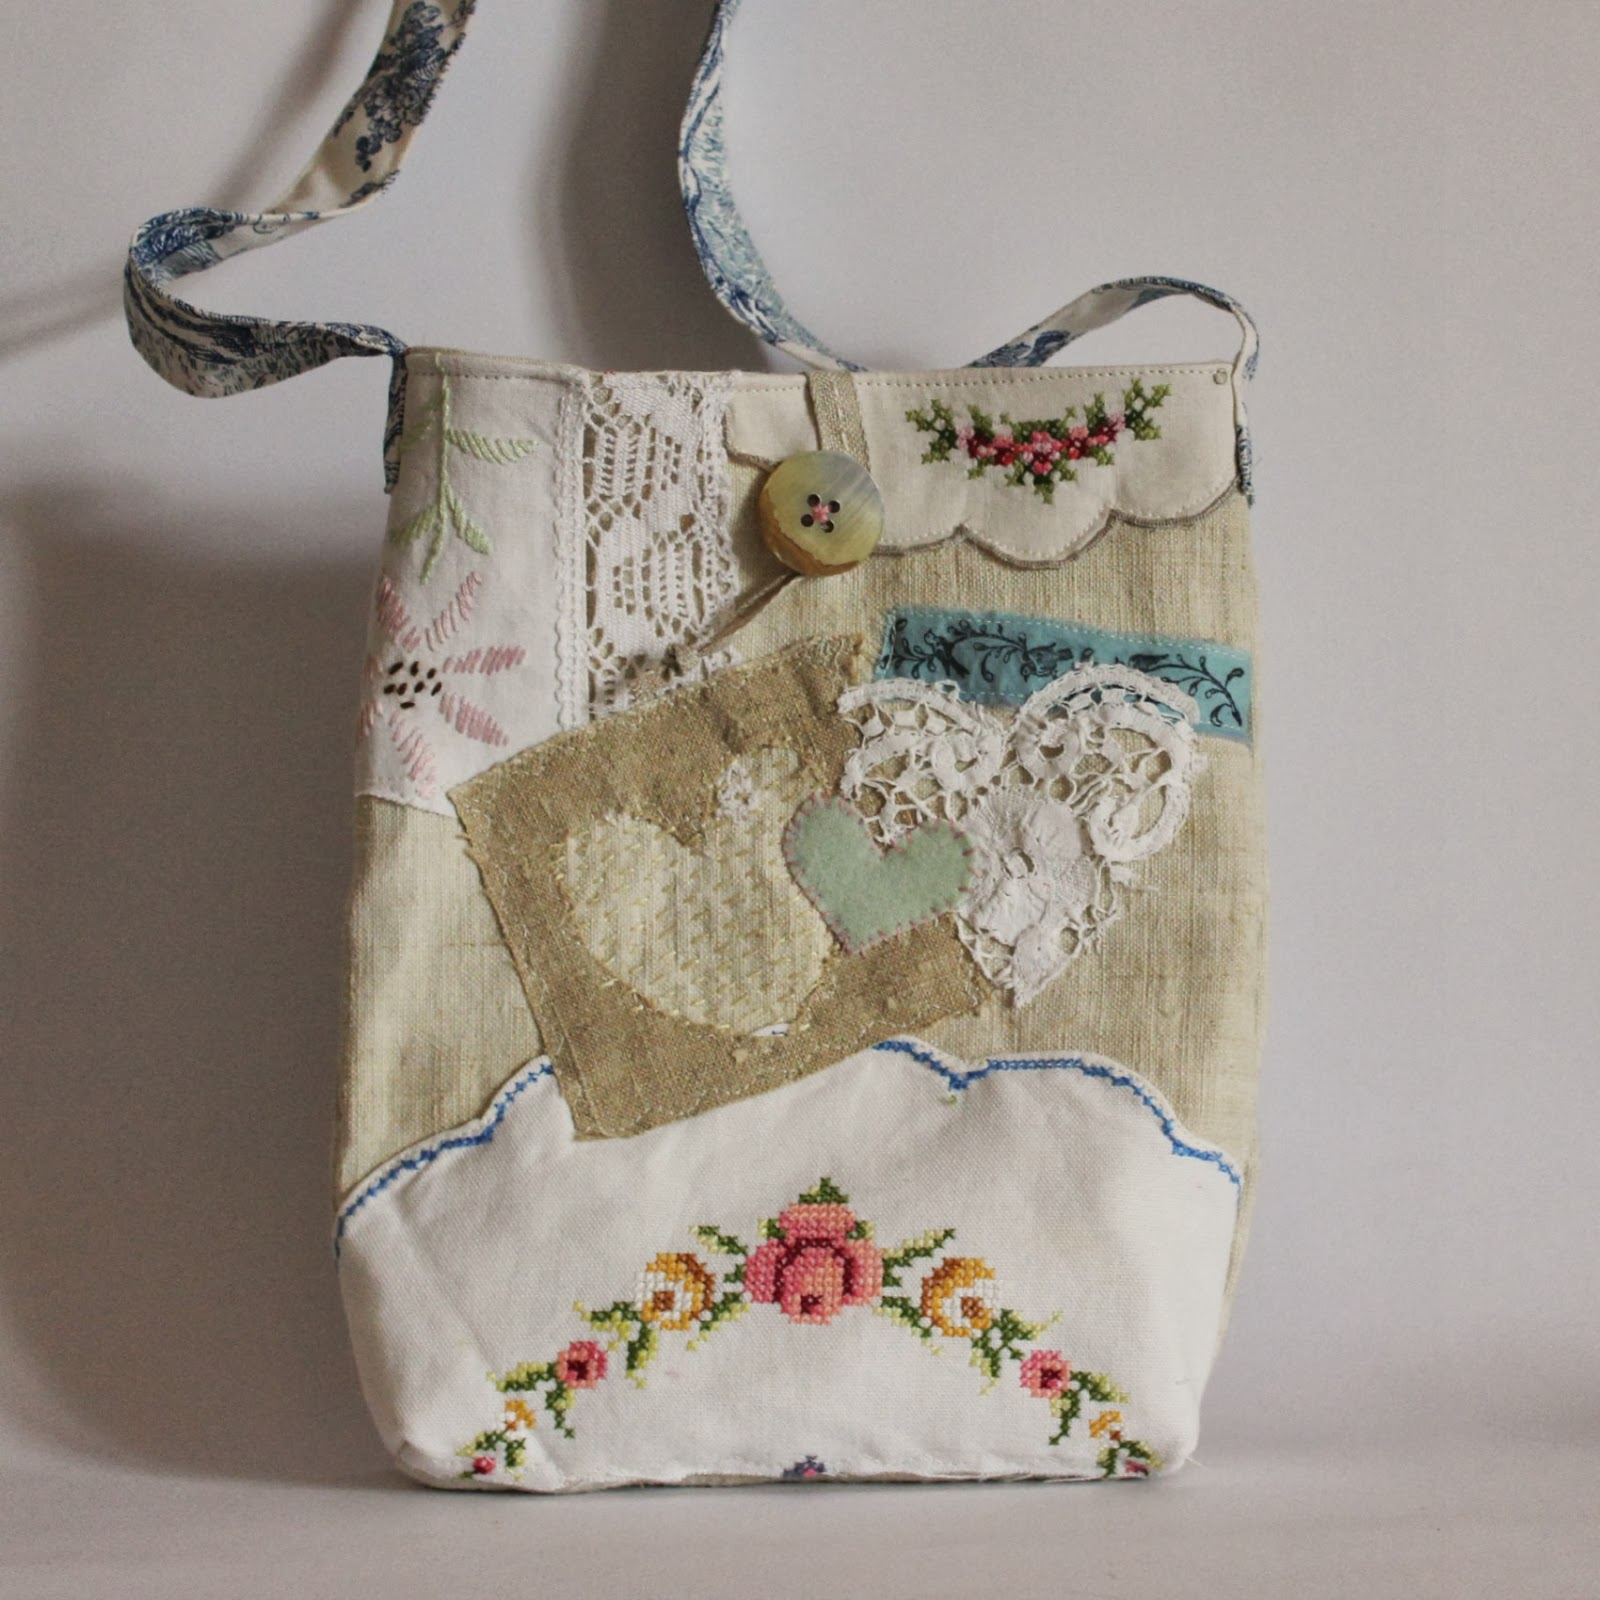 Бохо сумка своими руками выкройки фото